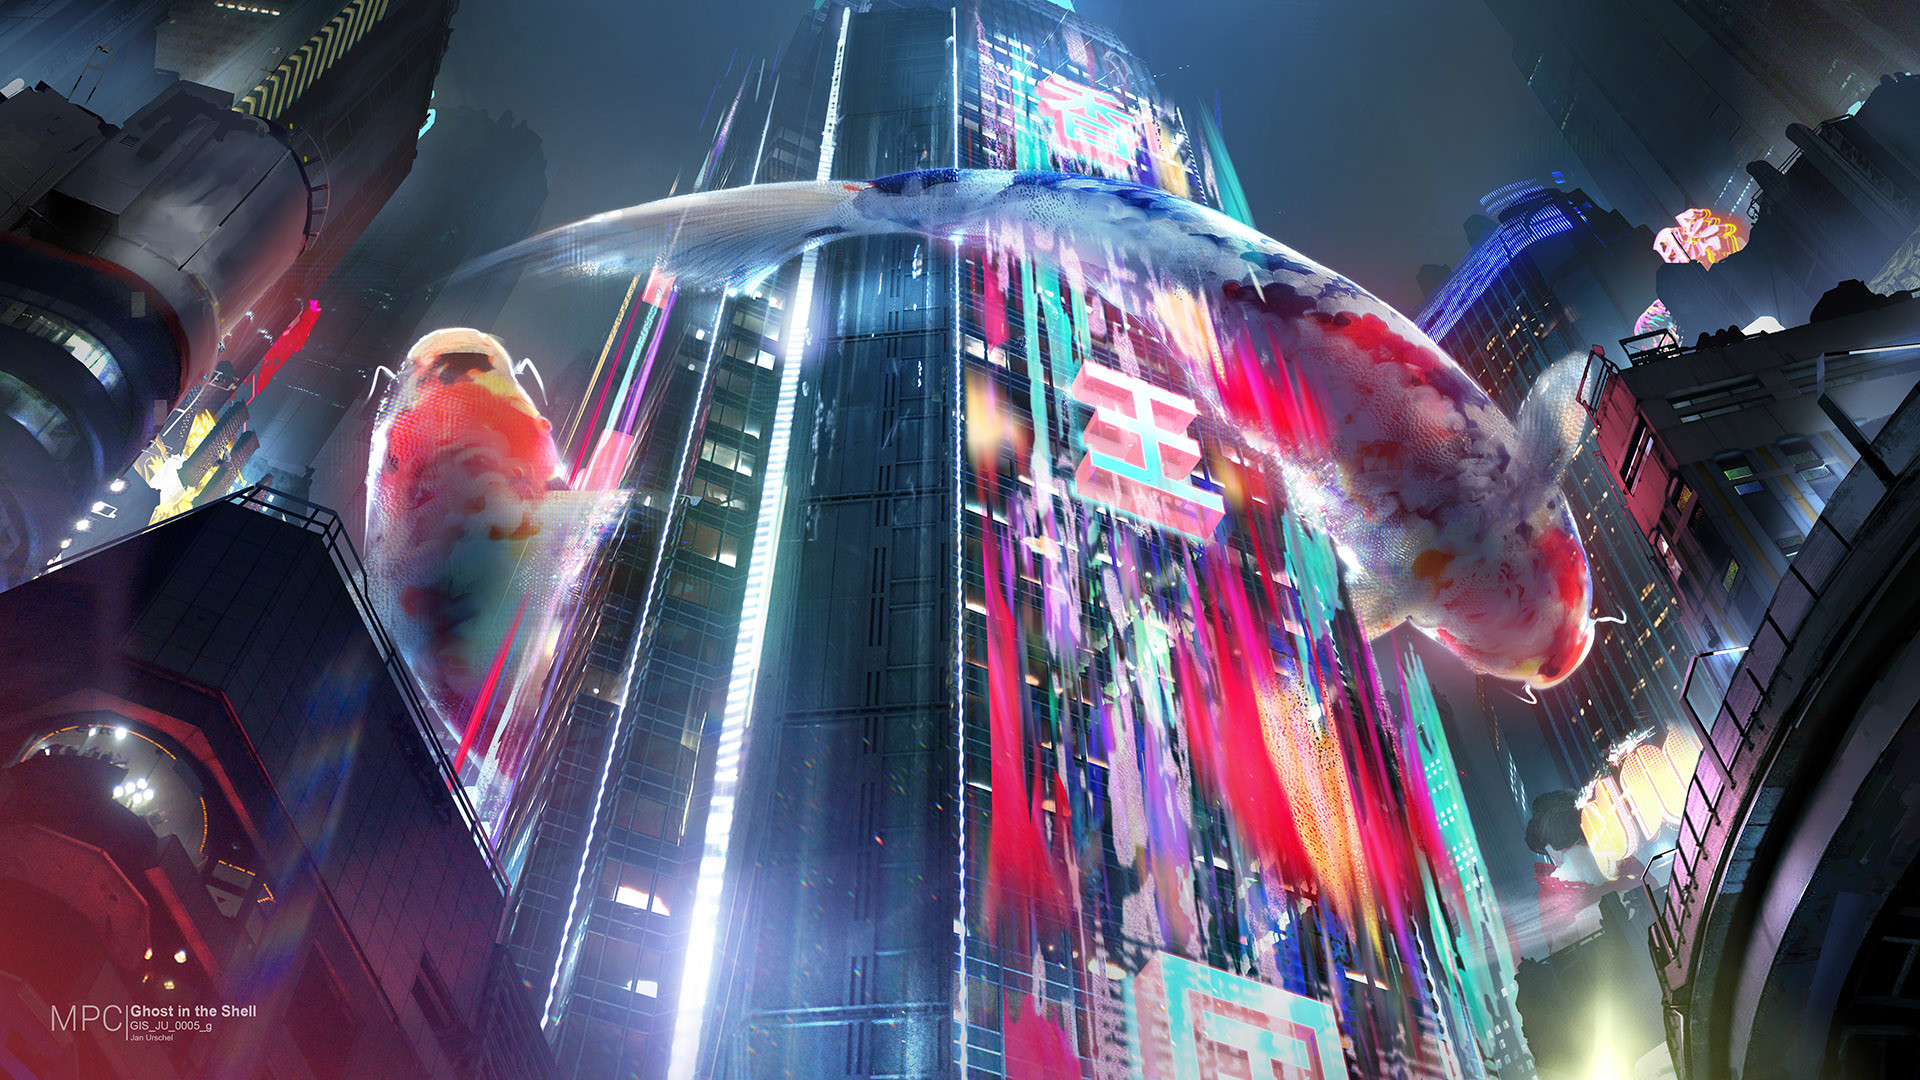 General 1920x1080 digital art fantasy art futuristic futuristic city Ghost in the Shell fish colorful concept art building worm's eye view skyscraper neon Jan Urschel science fiction